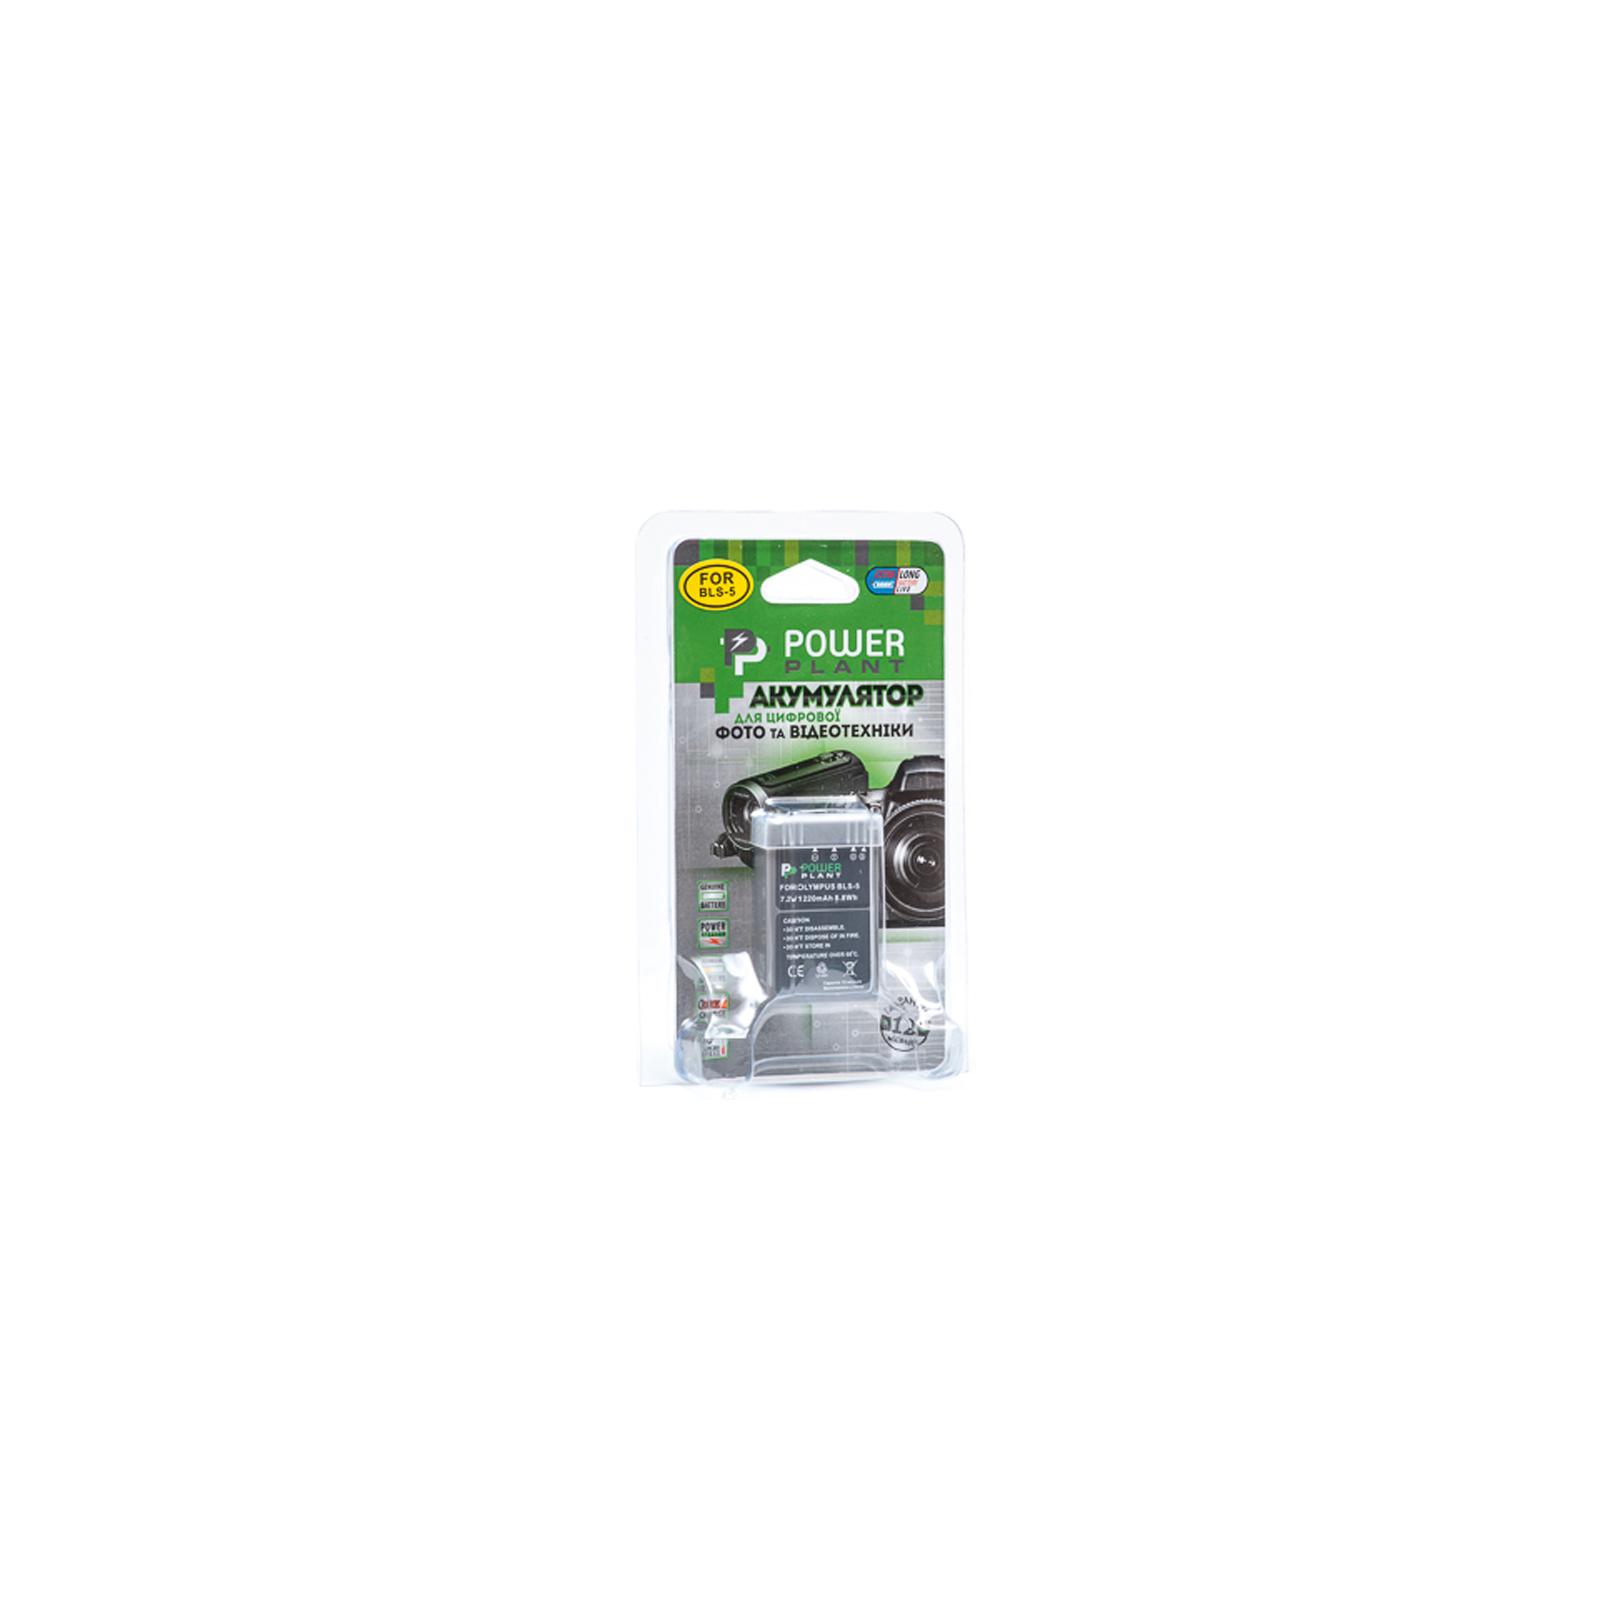 Аккумулятор к фото/видео PowerPlant Olympus PS-BLS5 (DV00DV1287) изображение 3